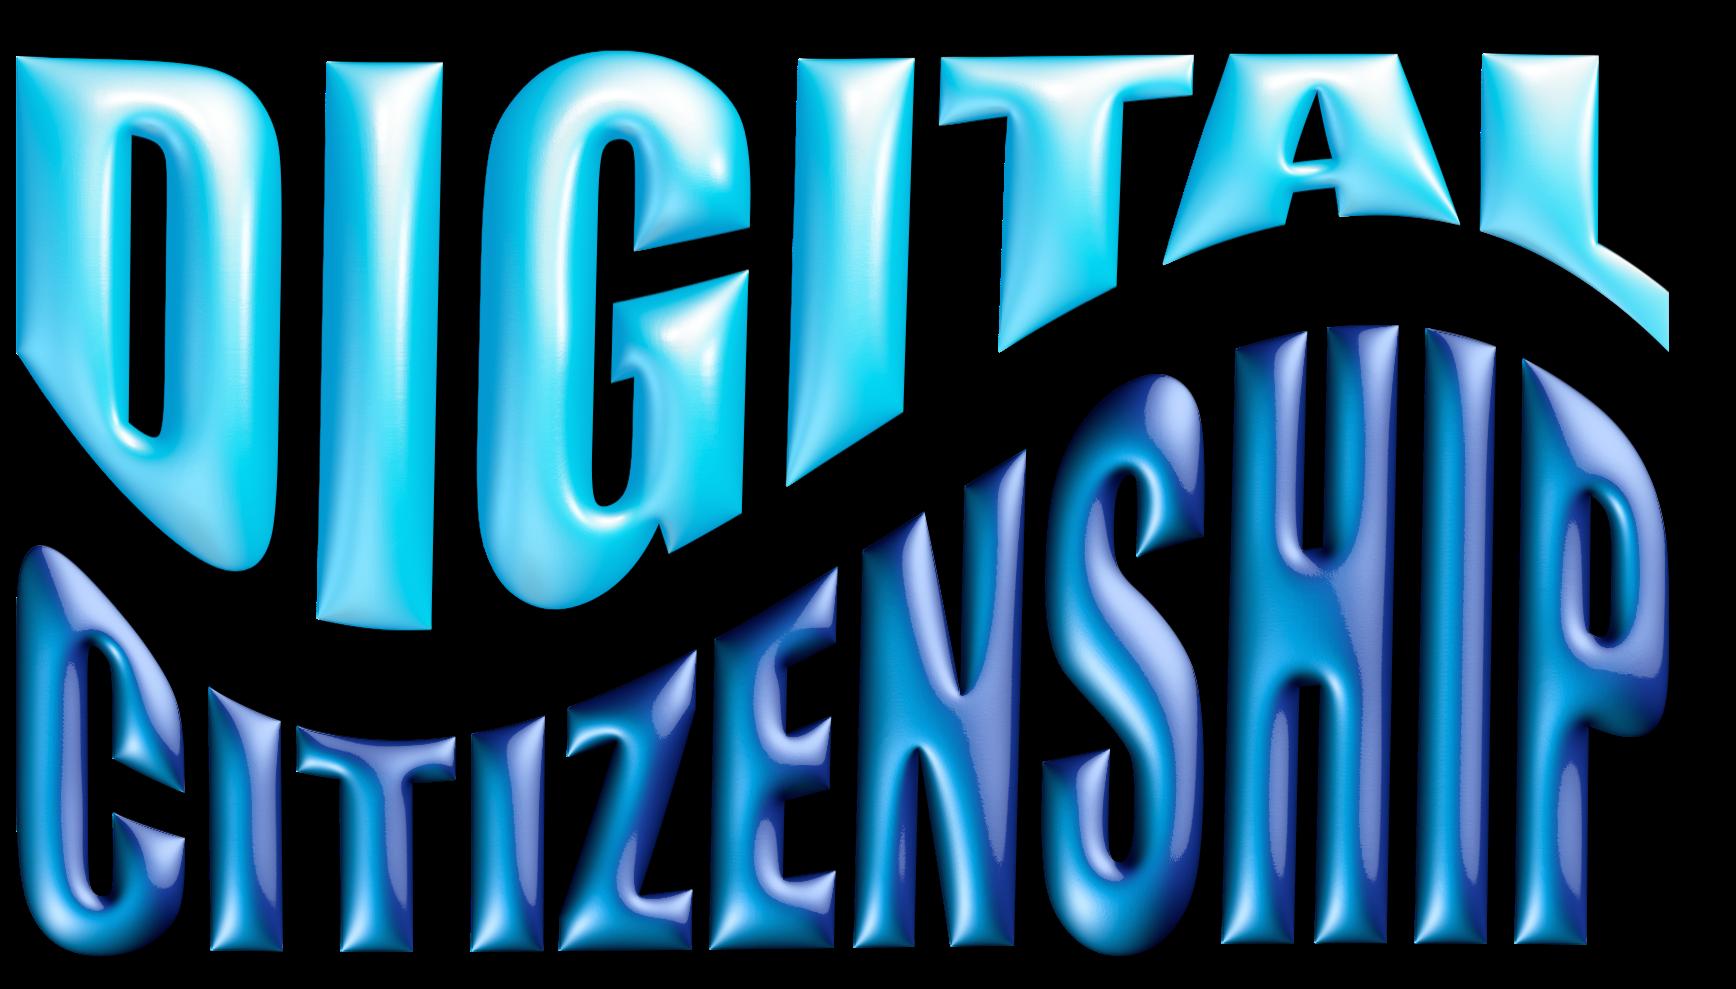 Missions clipart citizenship. Digital and parental controls